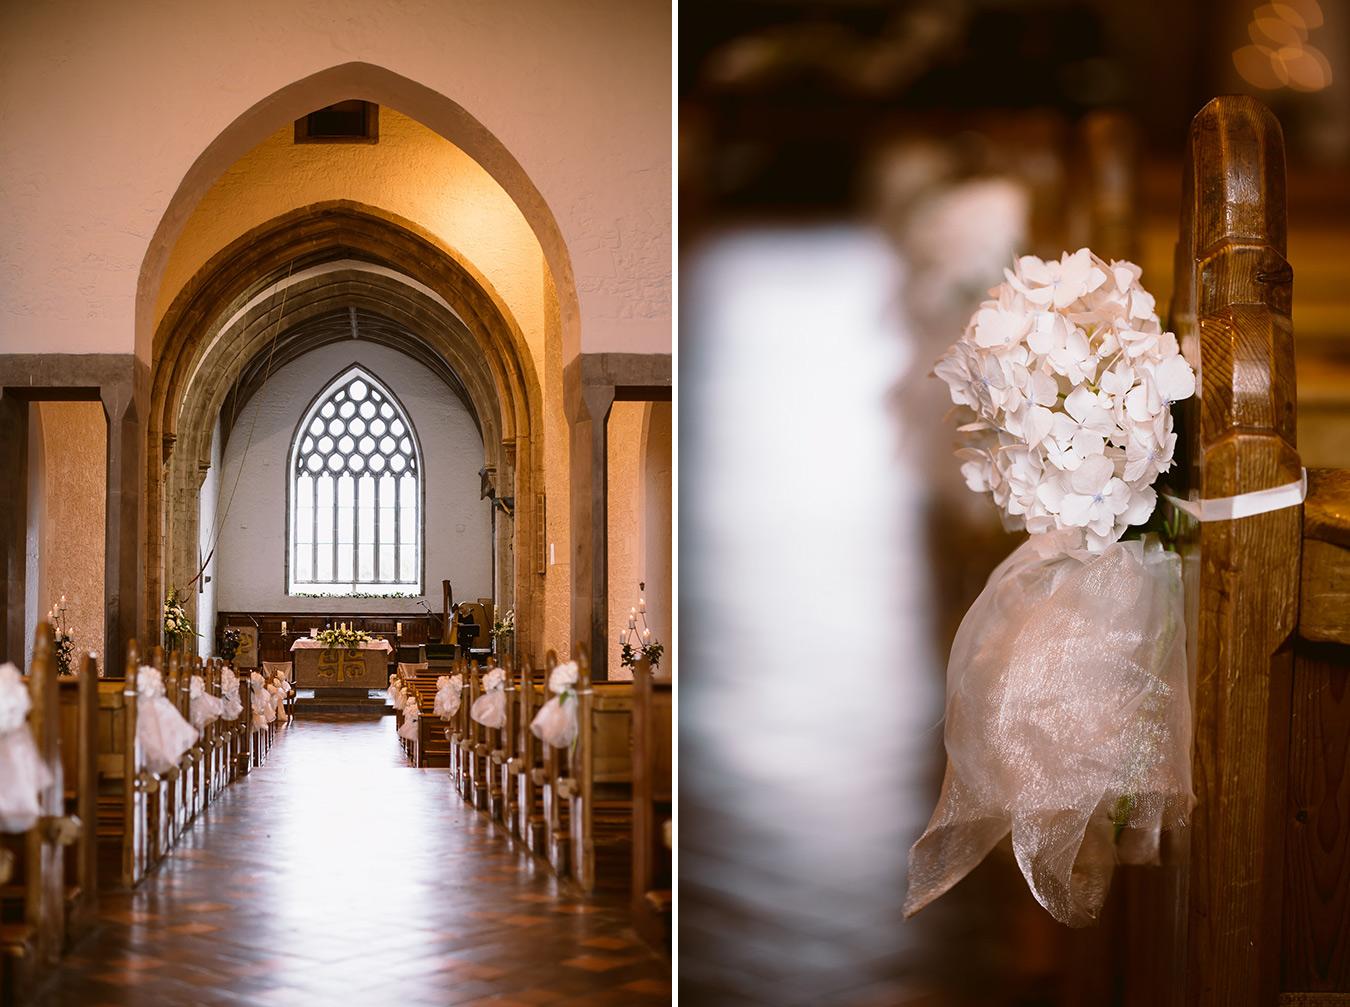 holycross-abbey-wedding